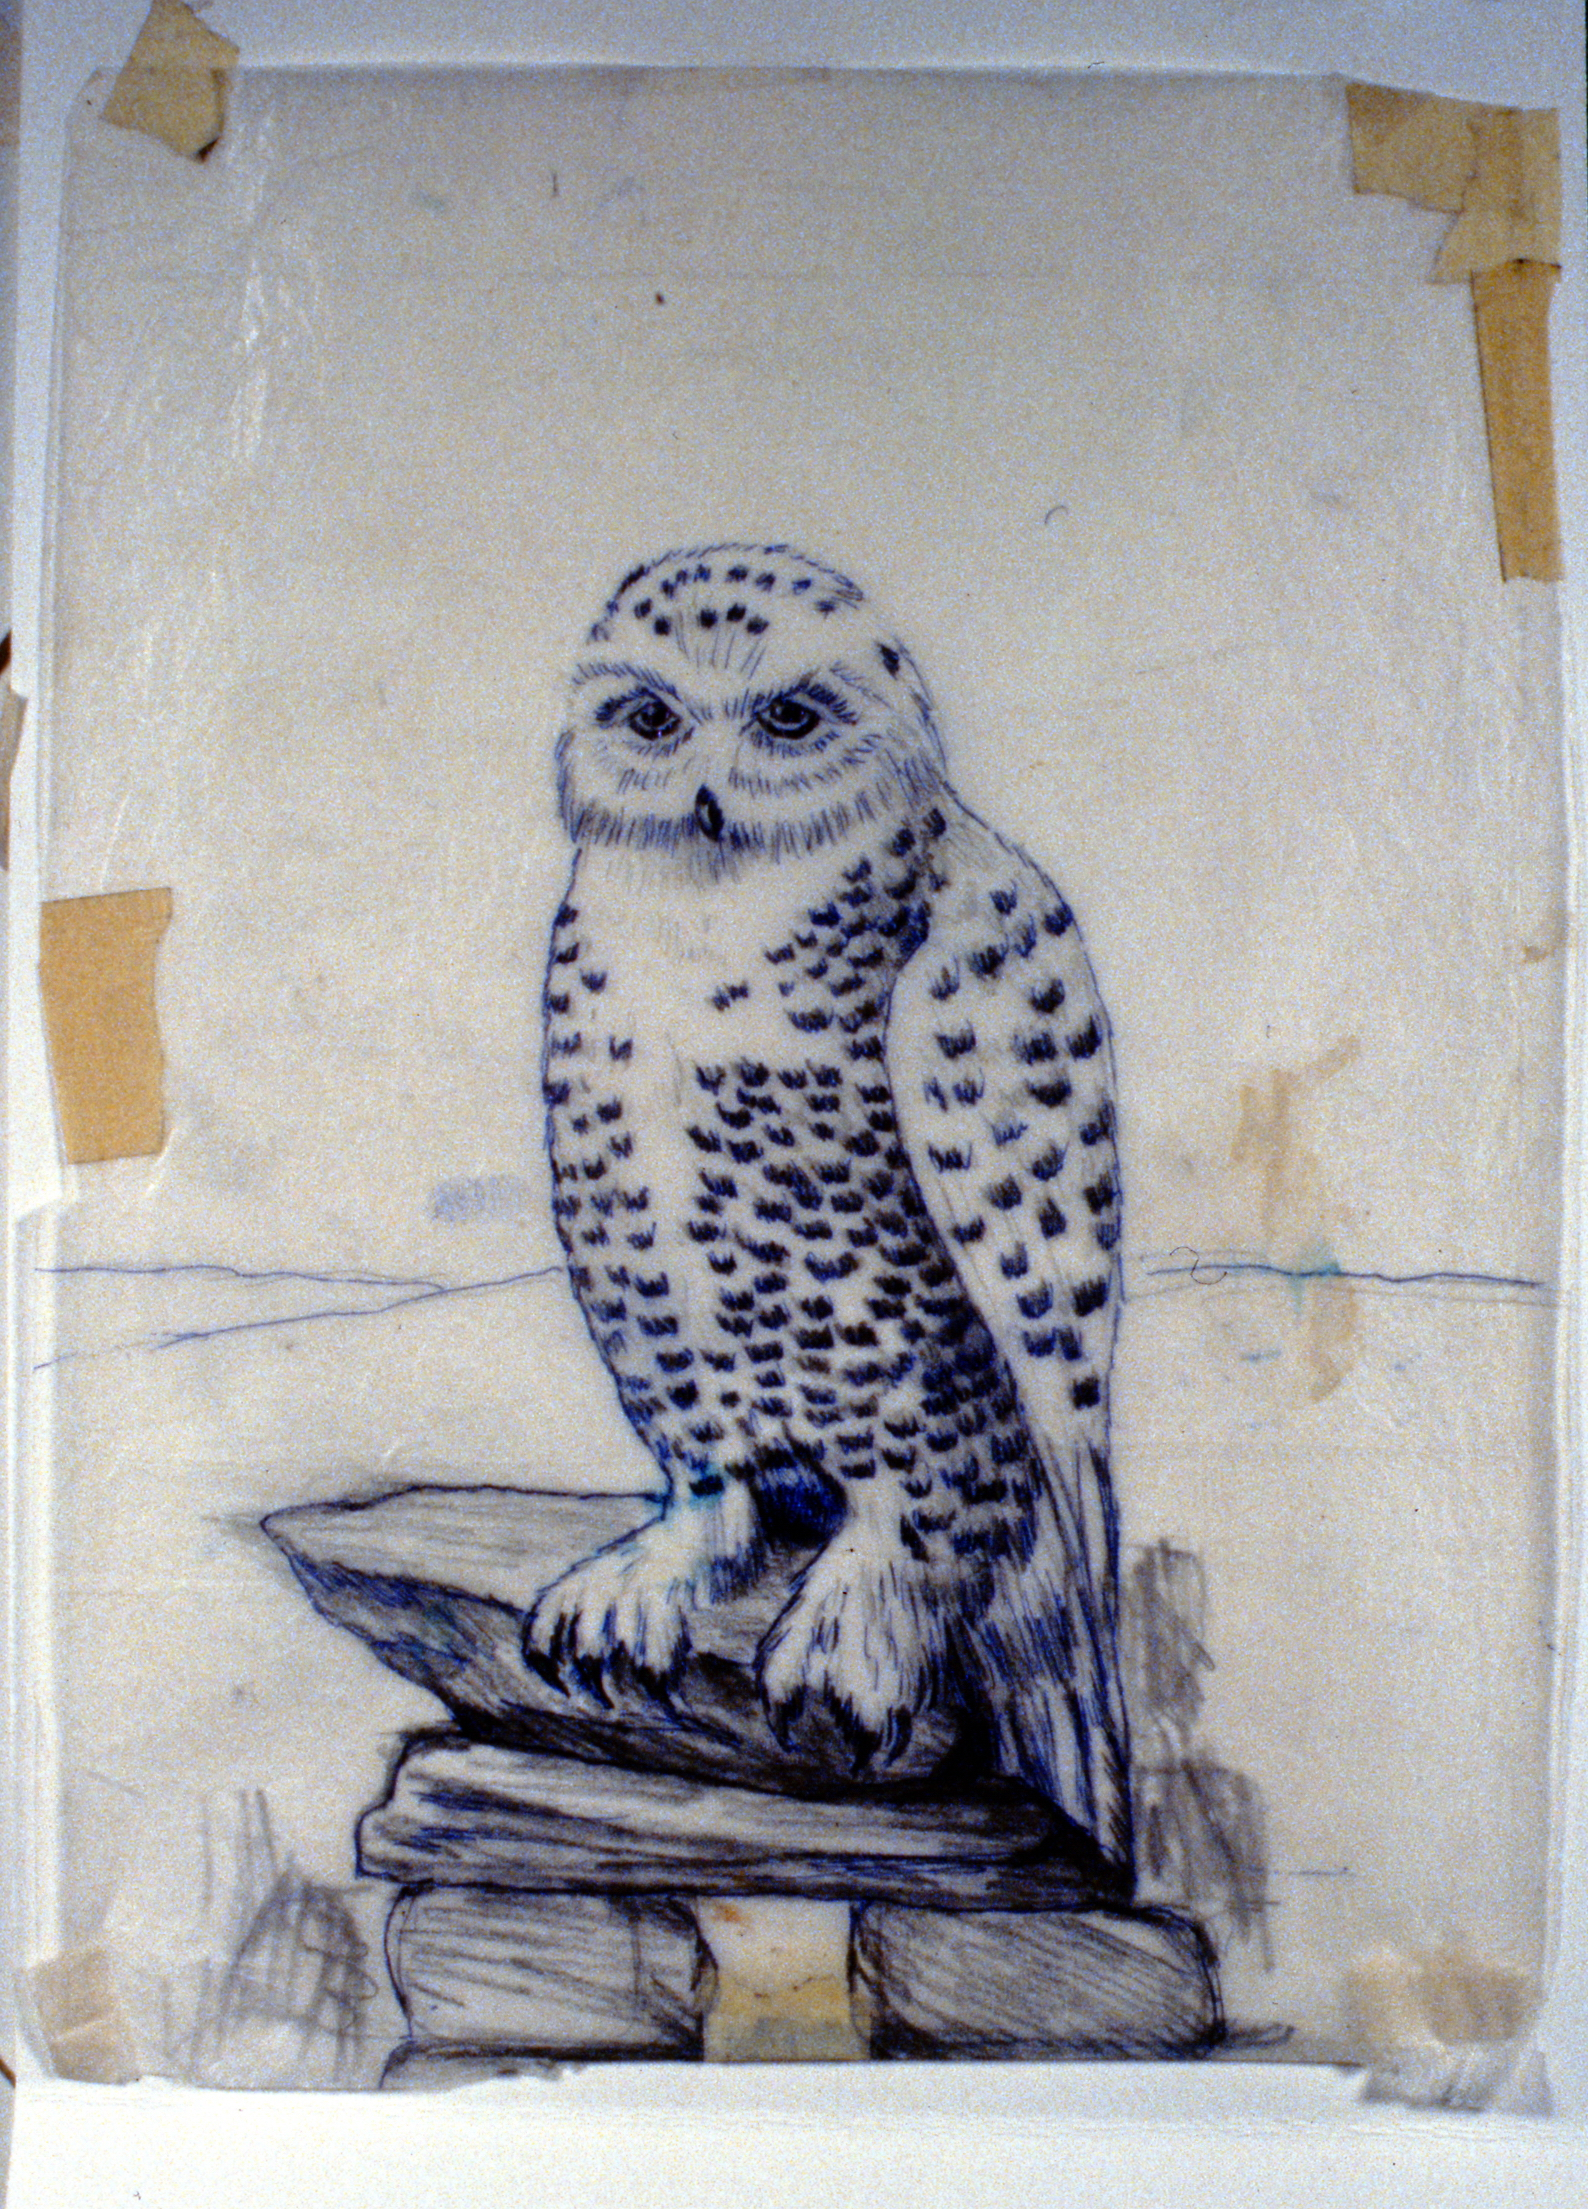 Snowy Owl , 1992, Minn Sjølseth, sketch, 27.5 x 21cm, 1996.02.04